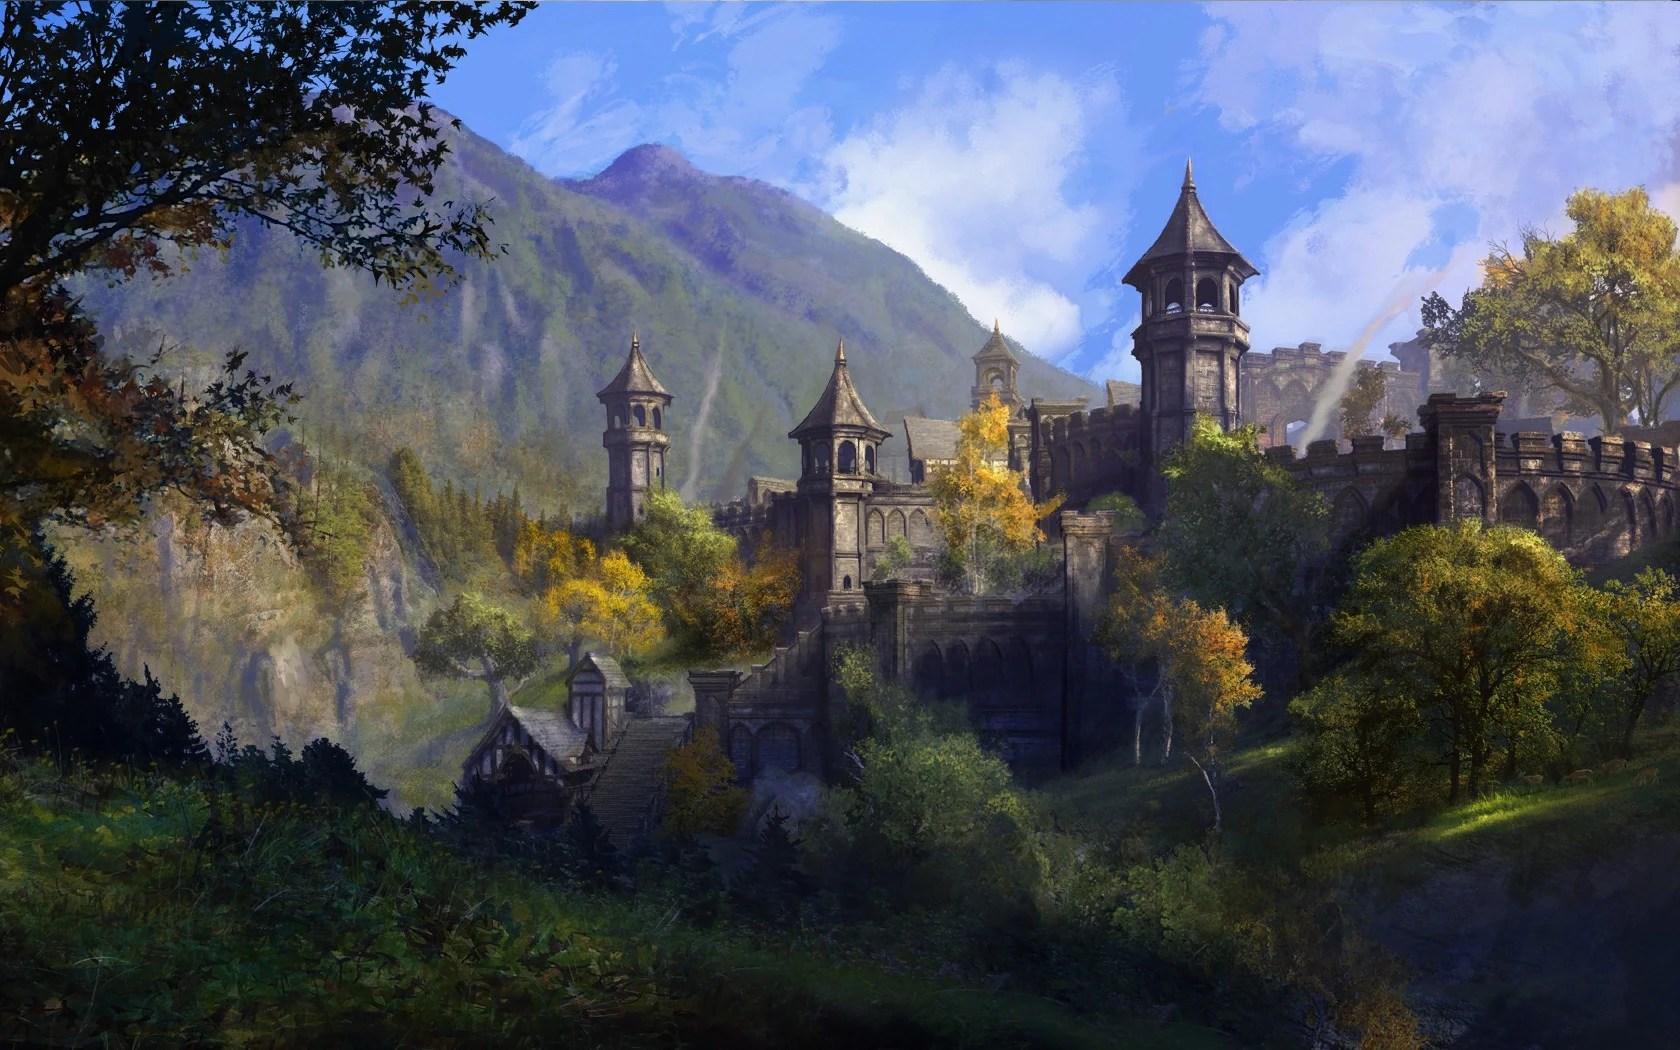 Skyrim Fall Wallpaper Hd High Rock Elder Scrolls Fandom Powered By Wikia